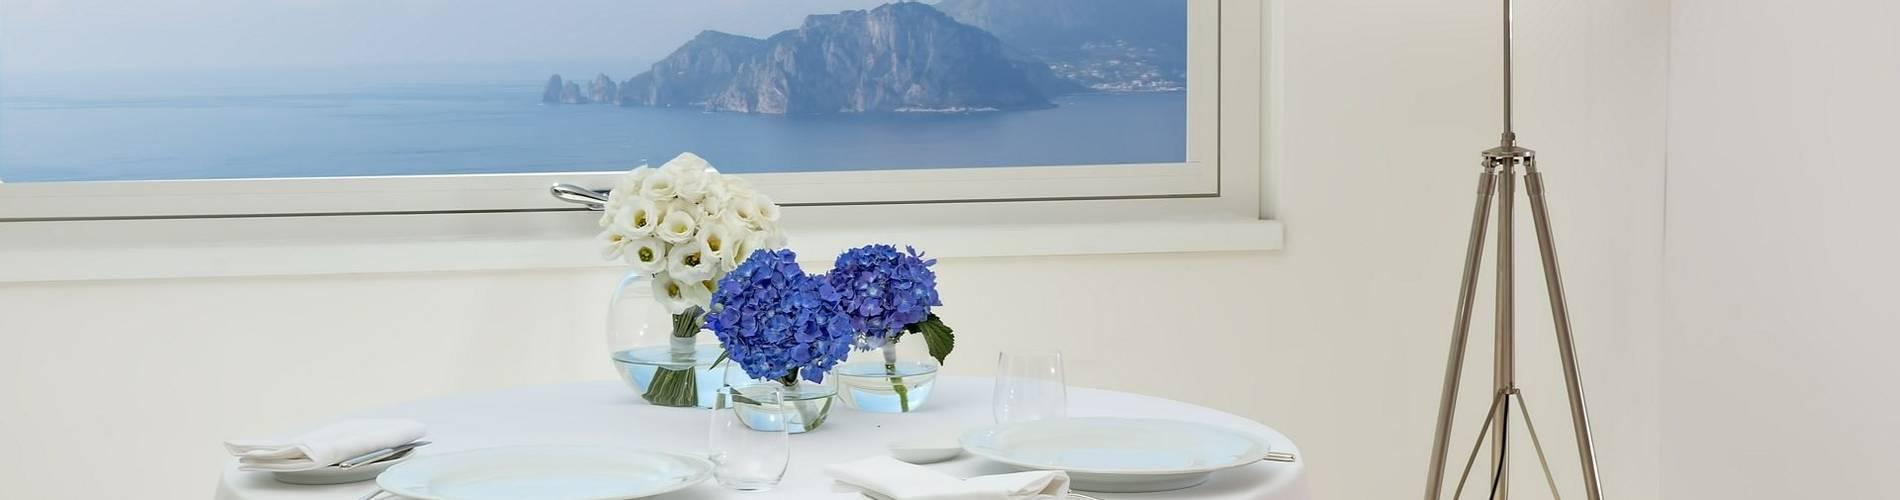 Relais Blu, Sorrento, Italy (11).jpg